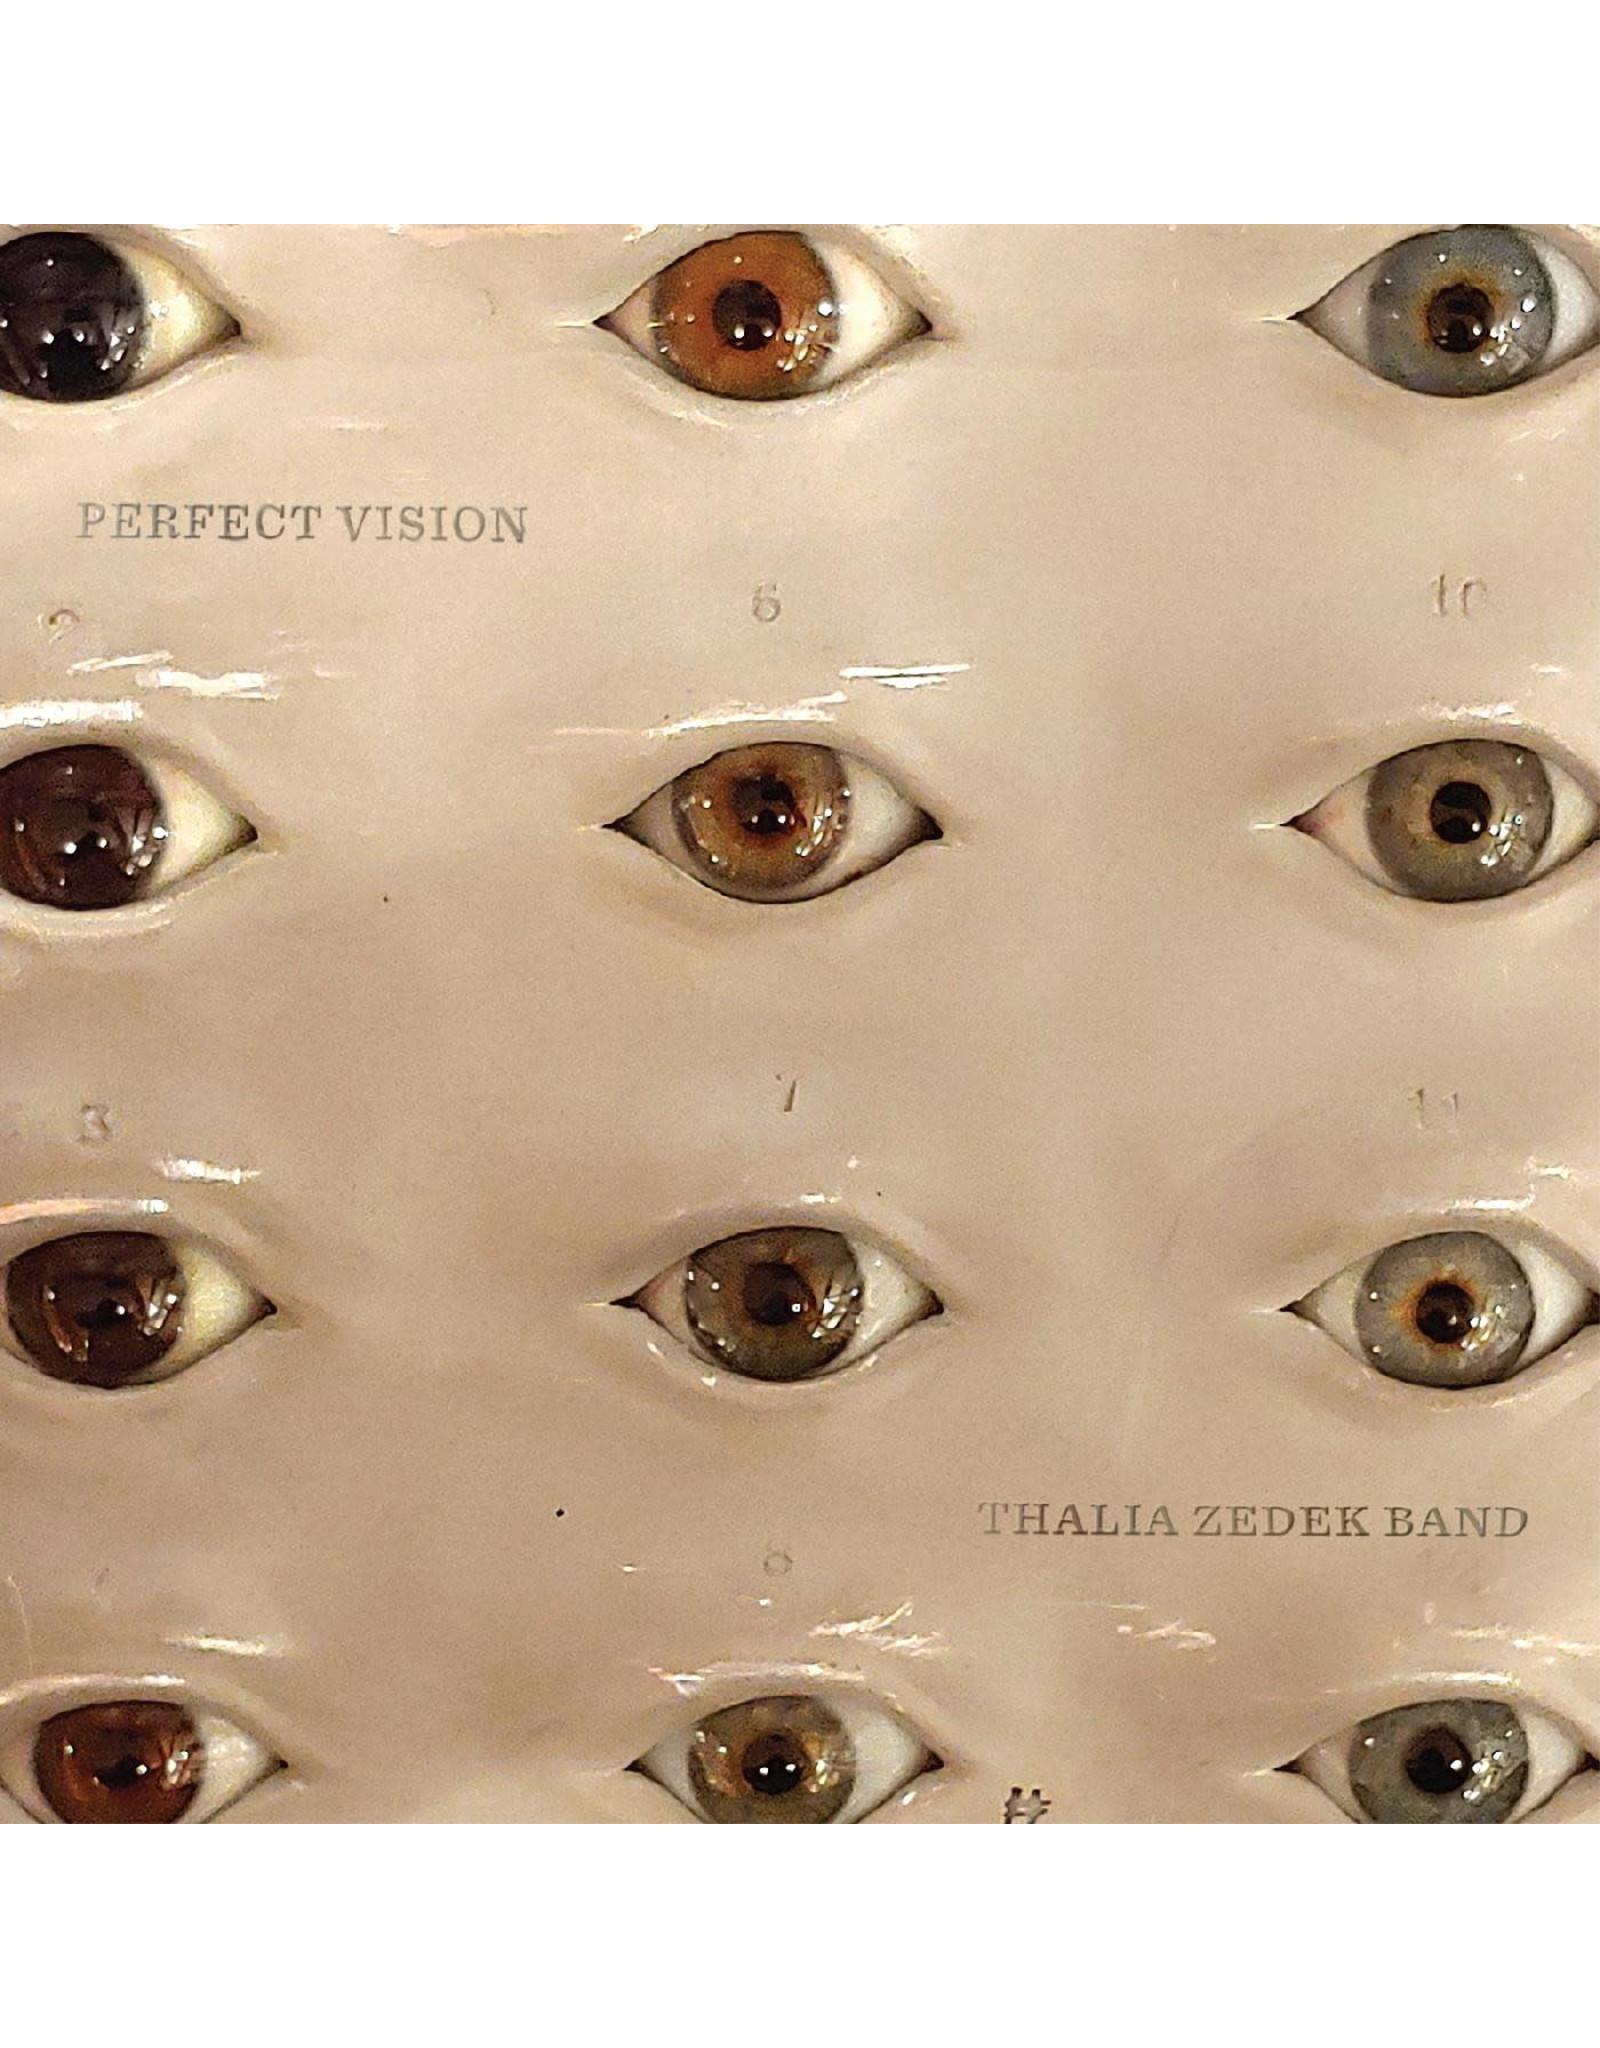 New Vinyl Thalia Zedek Band - Perfect Vision (Clear) LP